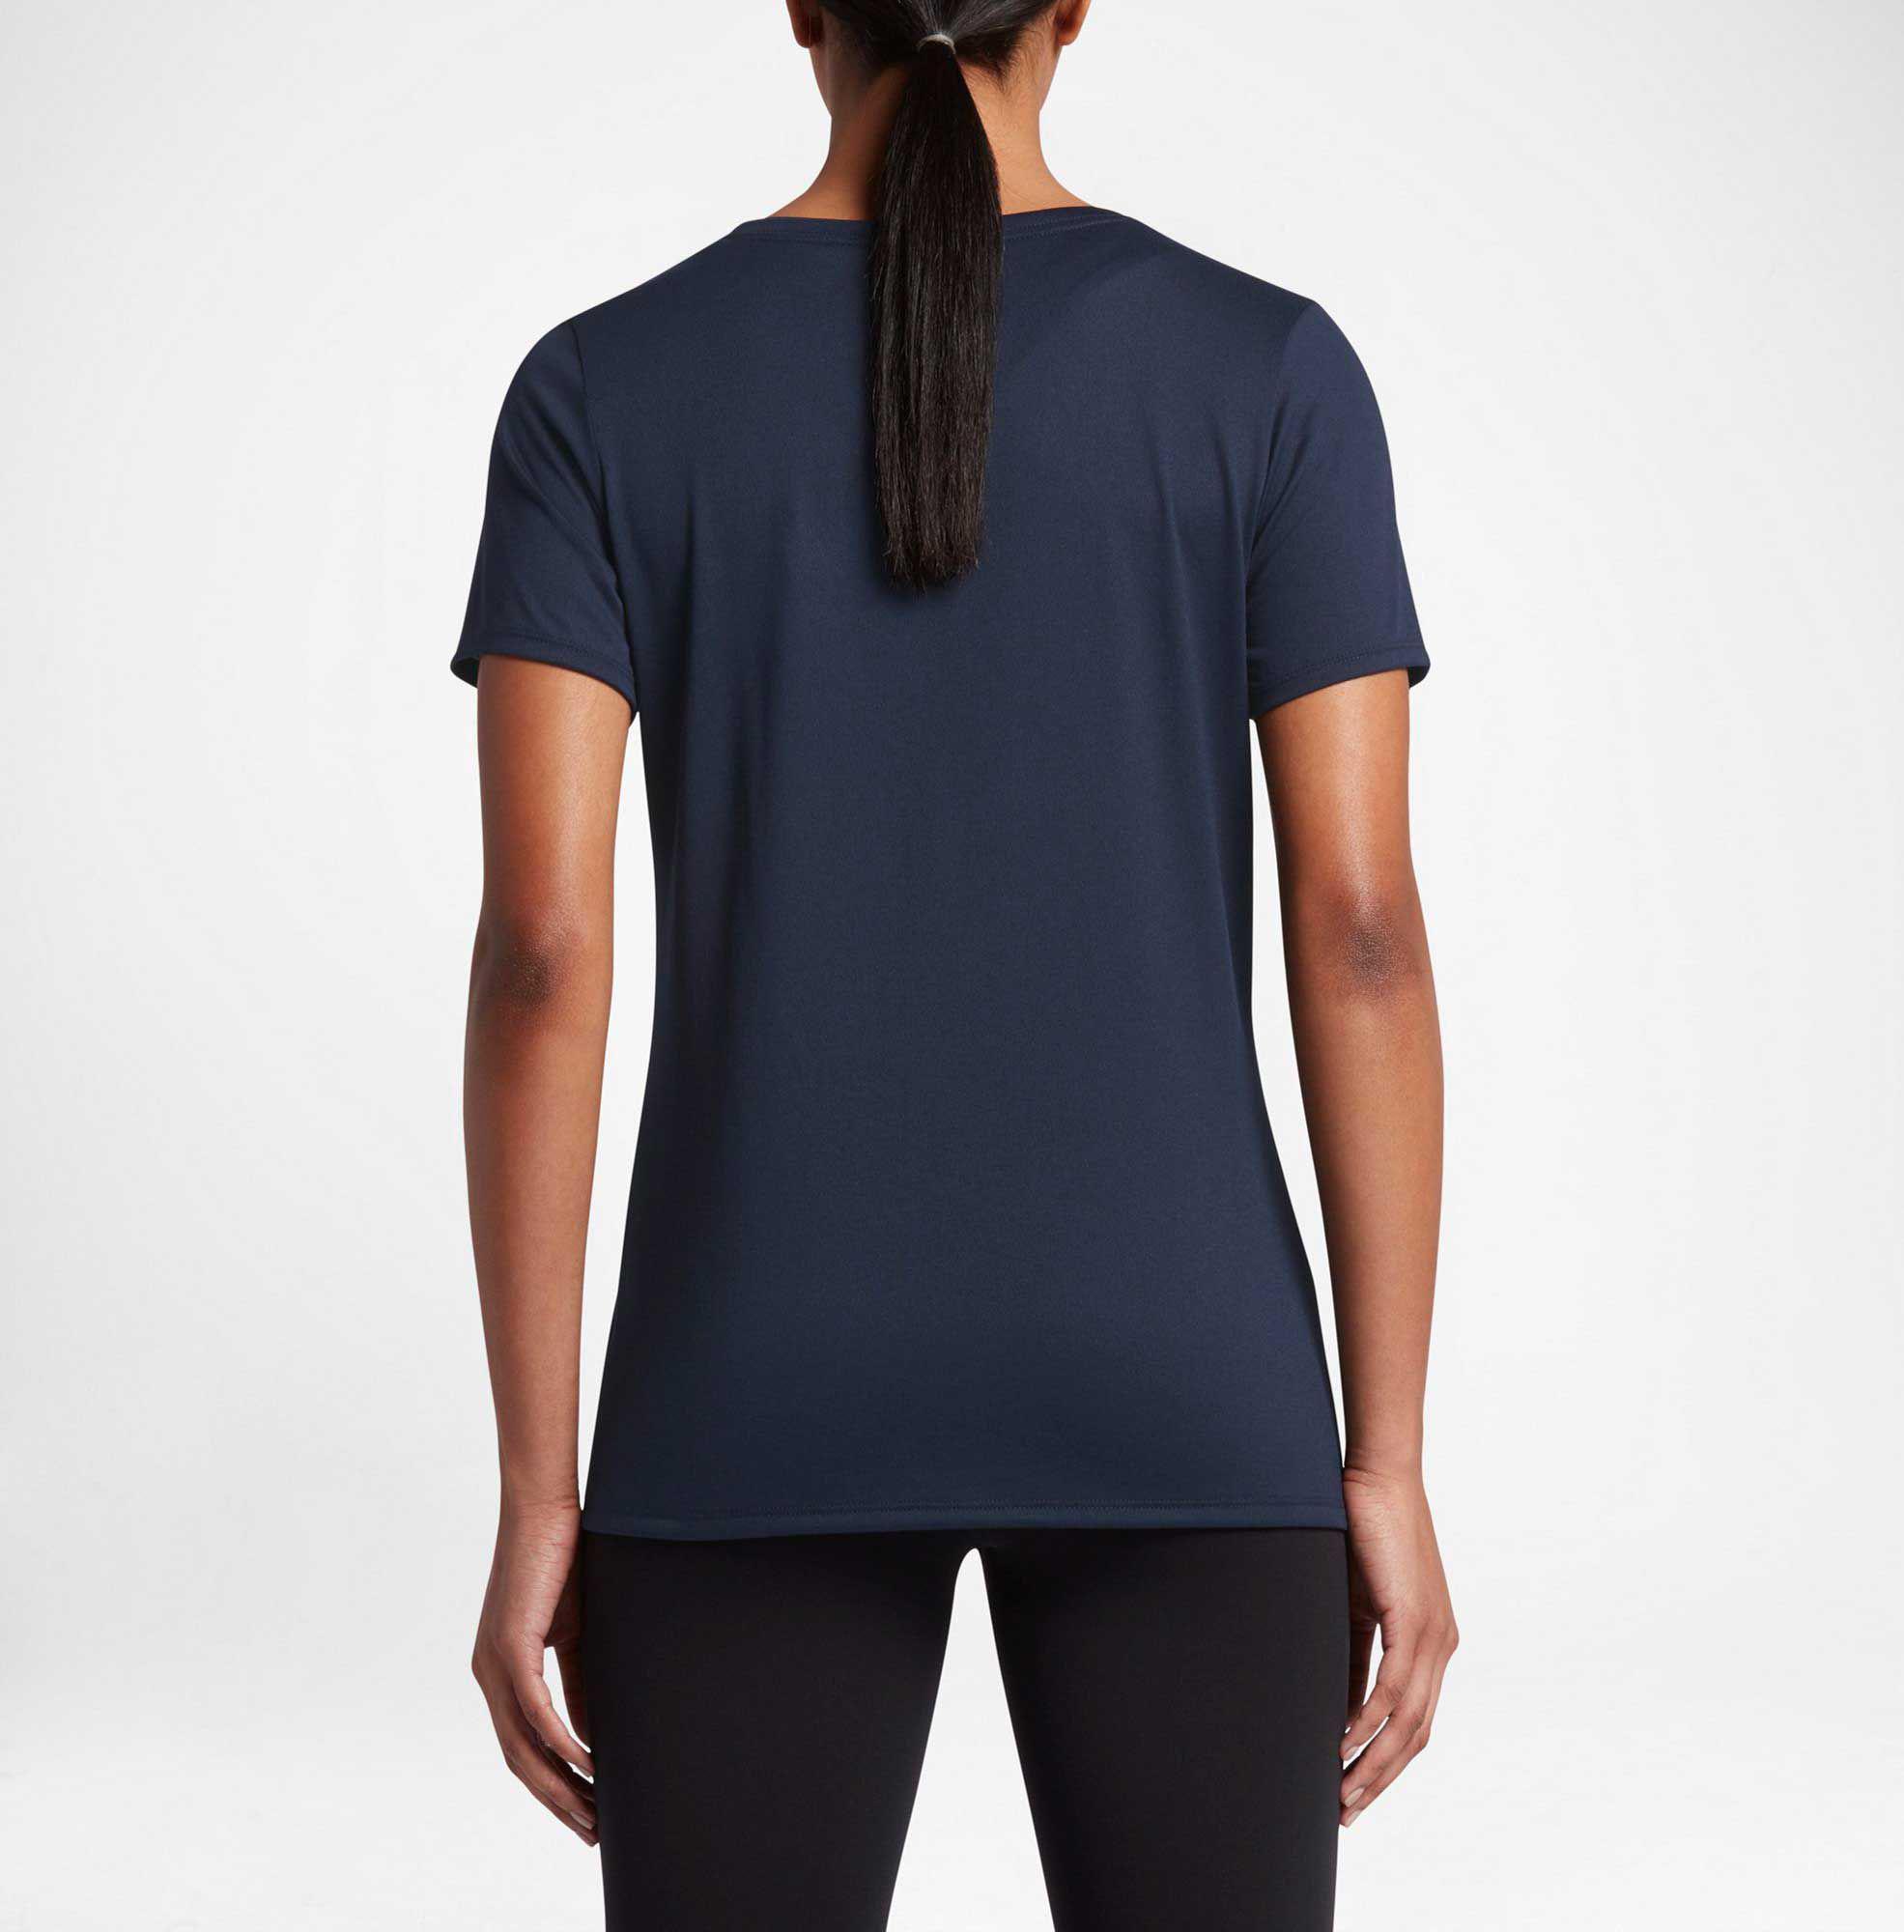 e6c735337c55 Nike - Blue Woman s Dry Legend Training T-shirt - Lyst. View fullscreen